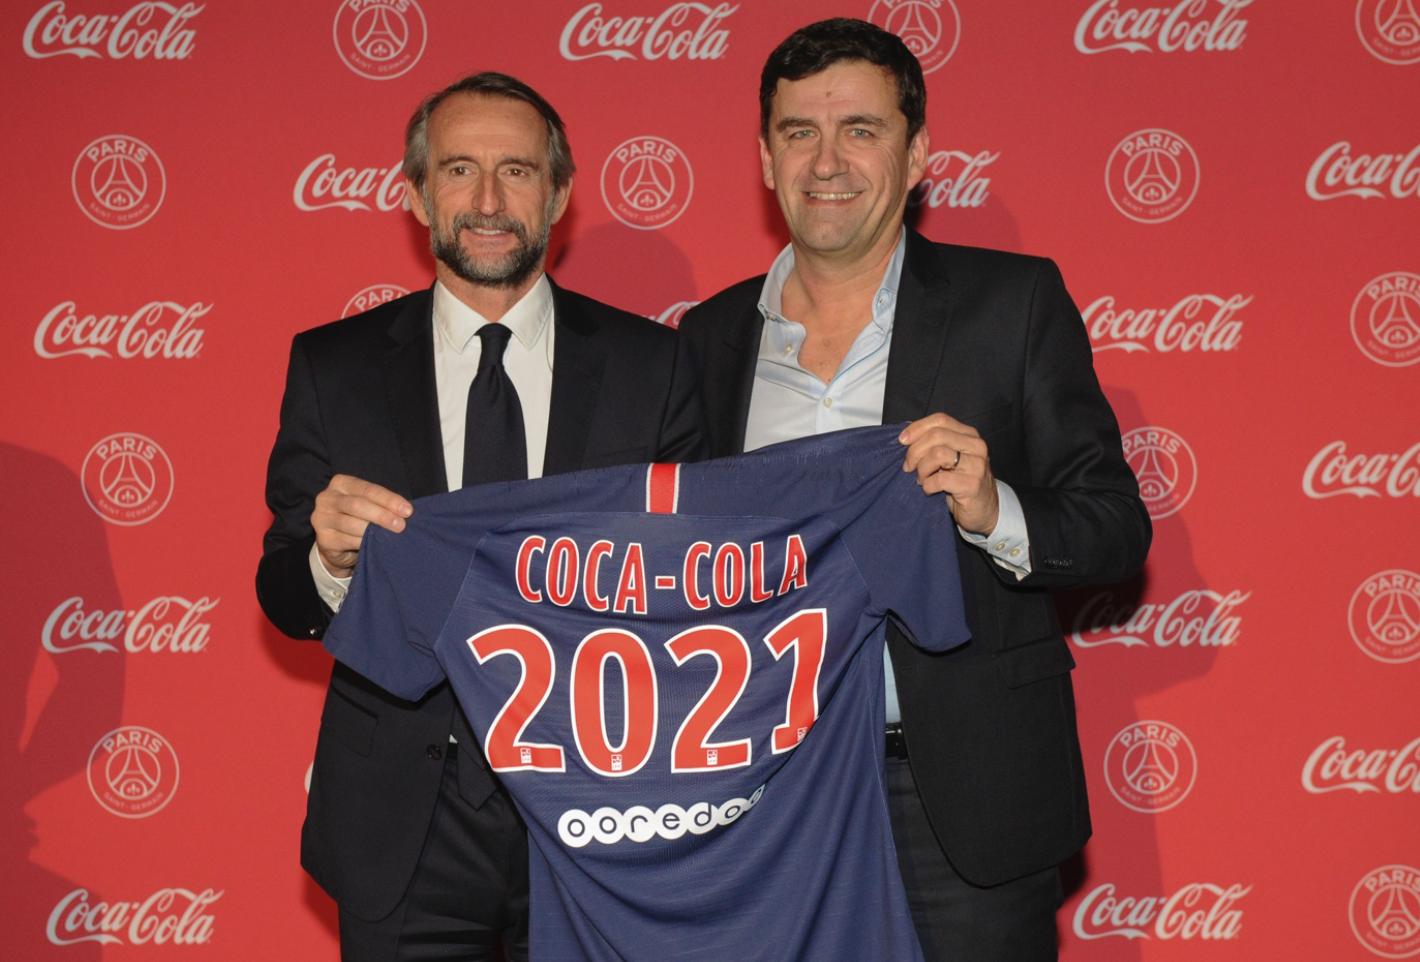 Jean Claude Blanc PSG Francois Gay-Belille Coca-Cola France